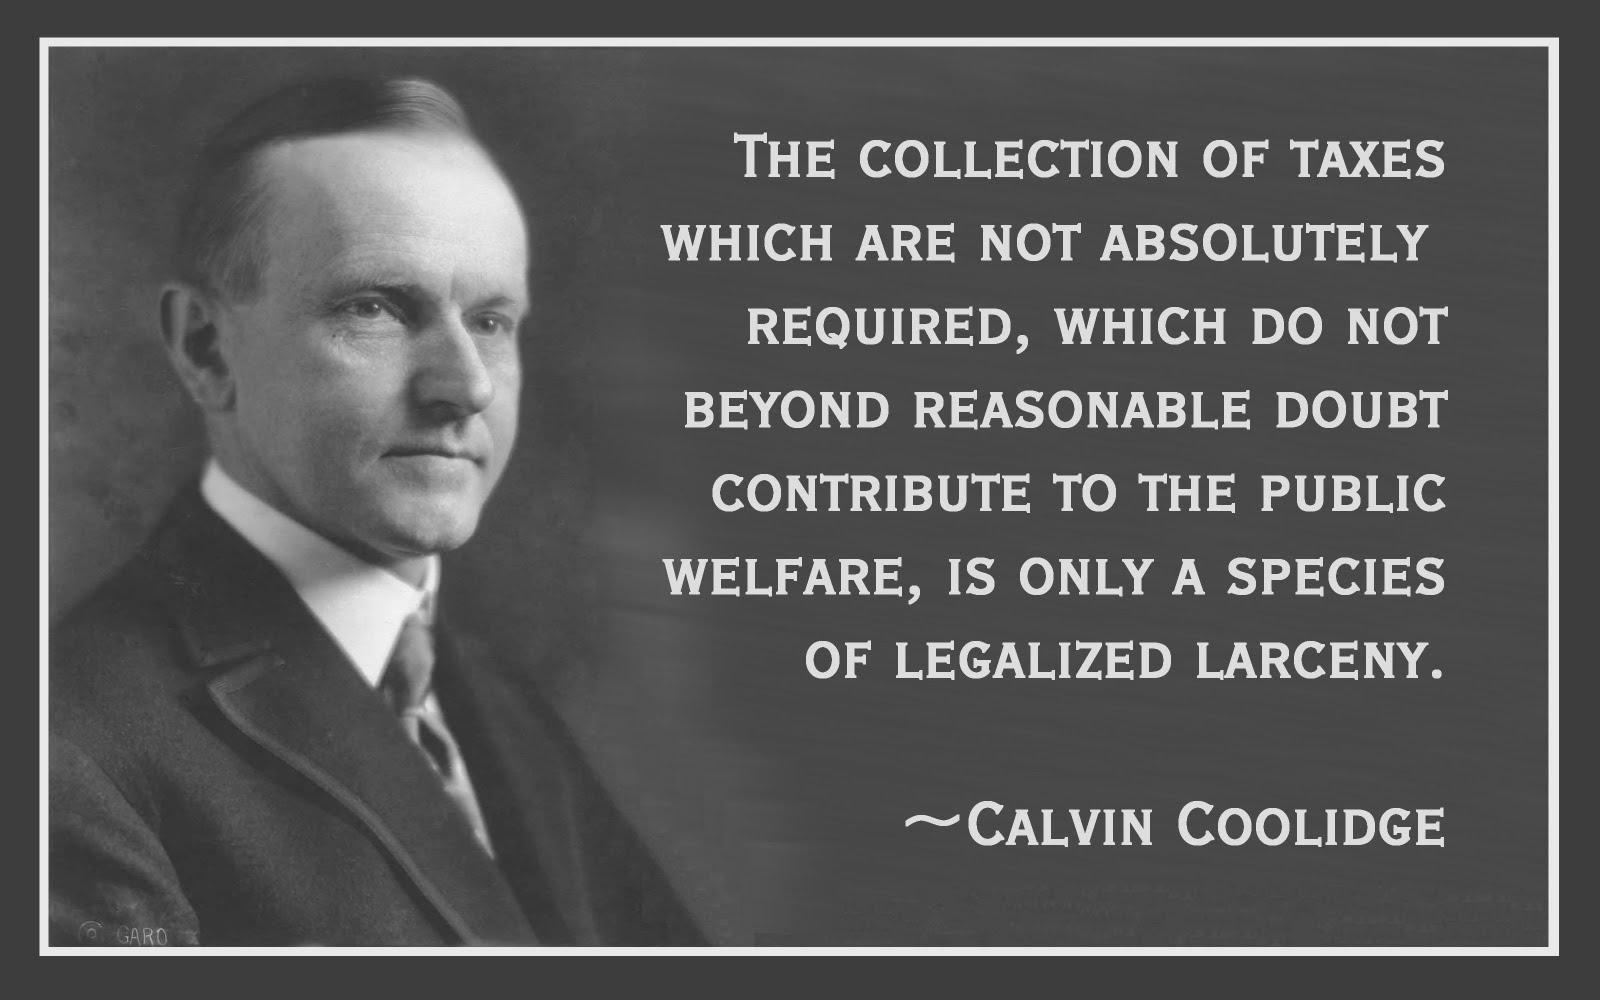 http://cdn.quotationof.com/images/calvin-coolidges-quotes-5.jpg